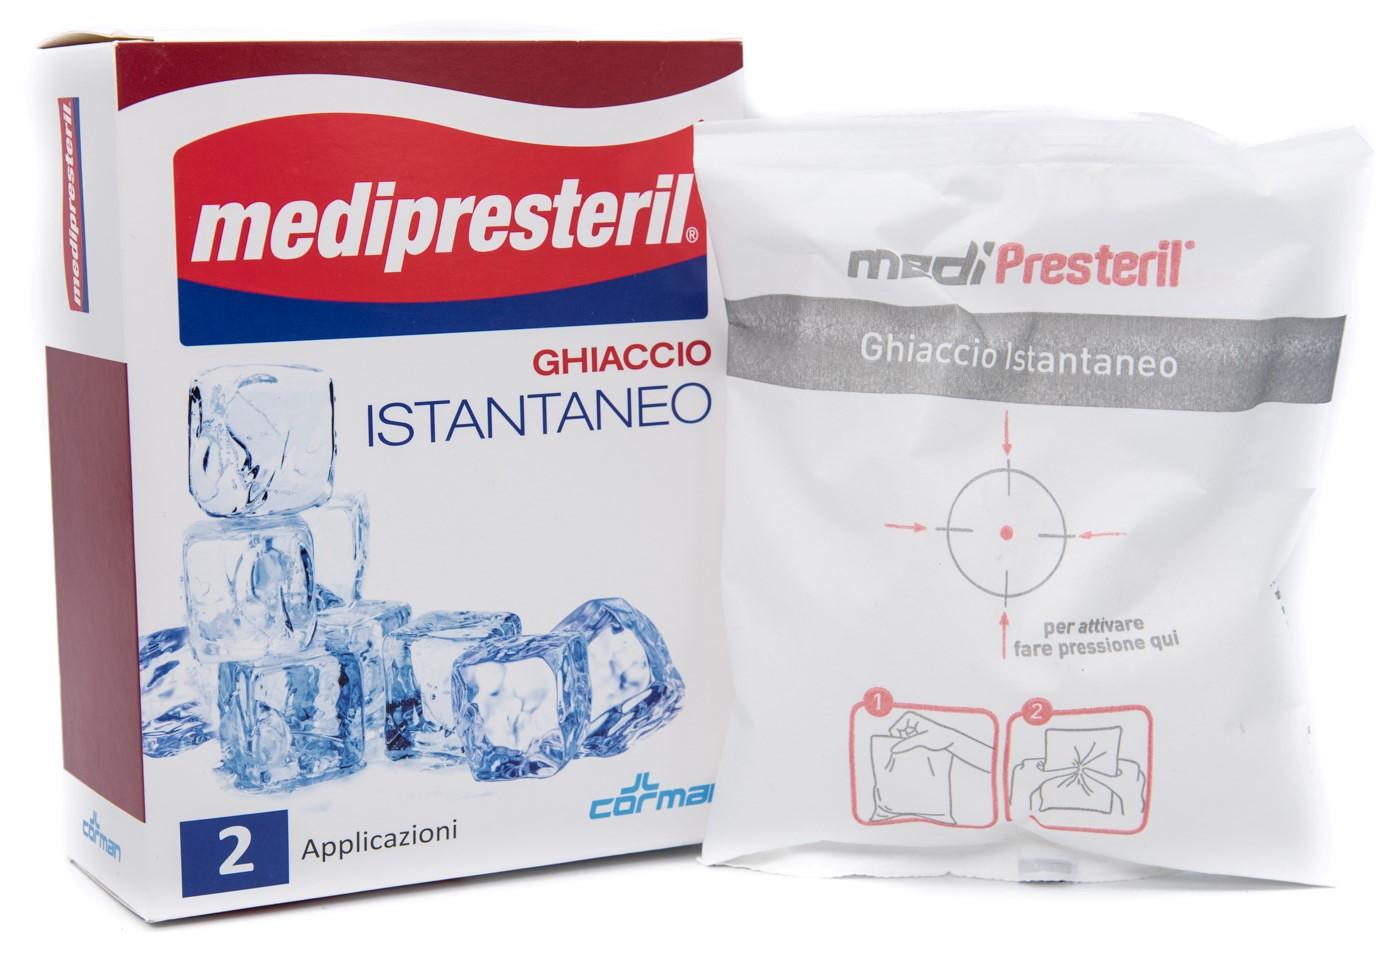 CORMAN SpA Medipresteril Ghiaccio Istantaneo 2bst